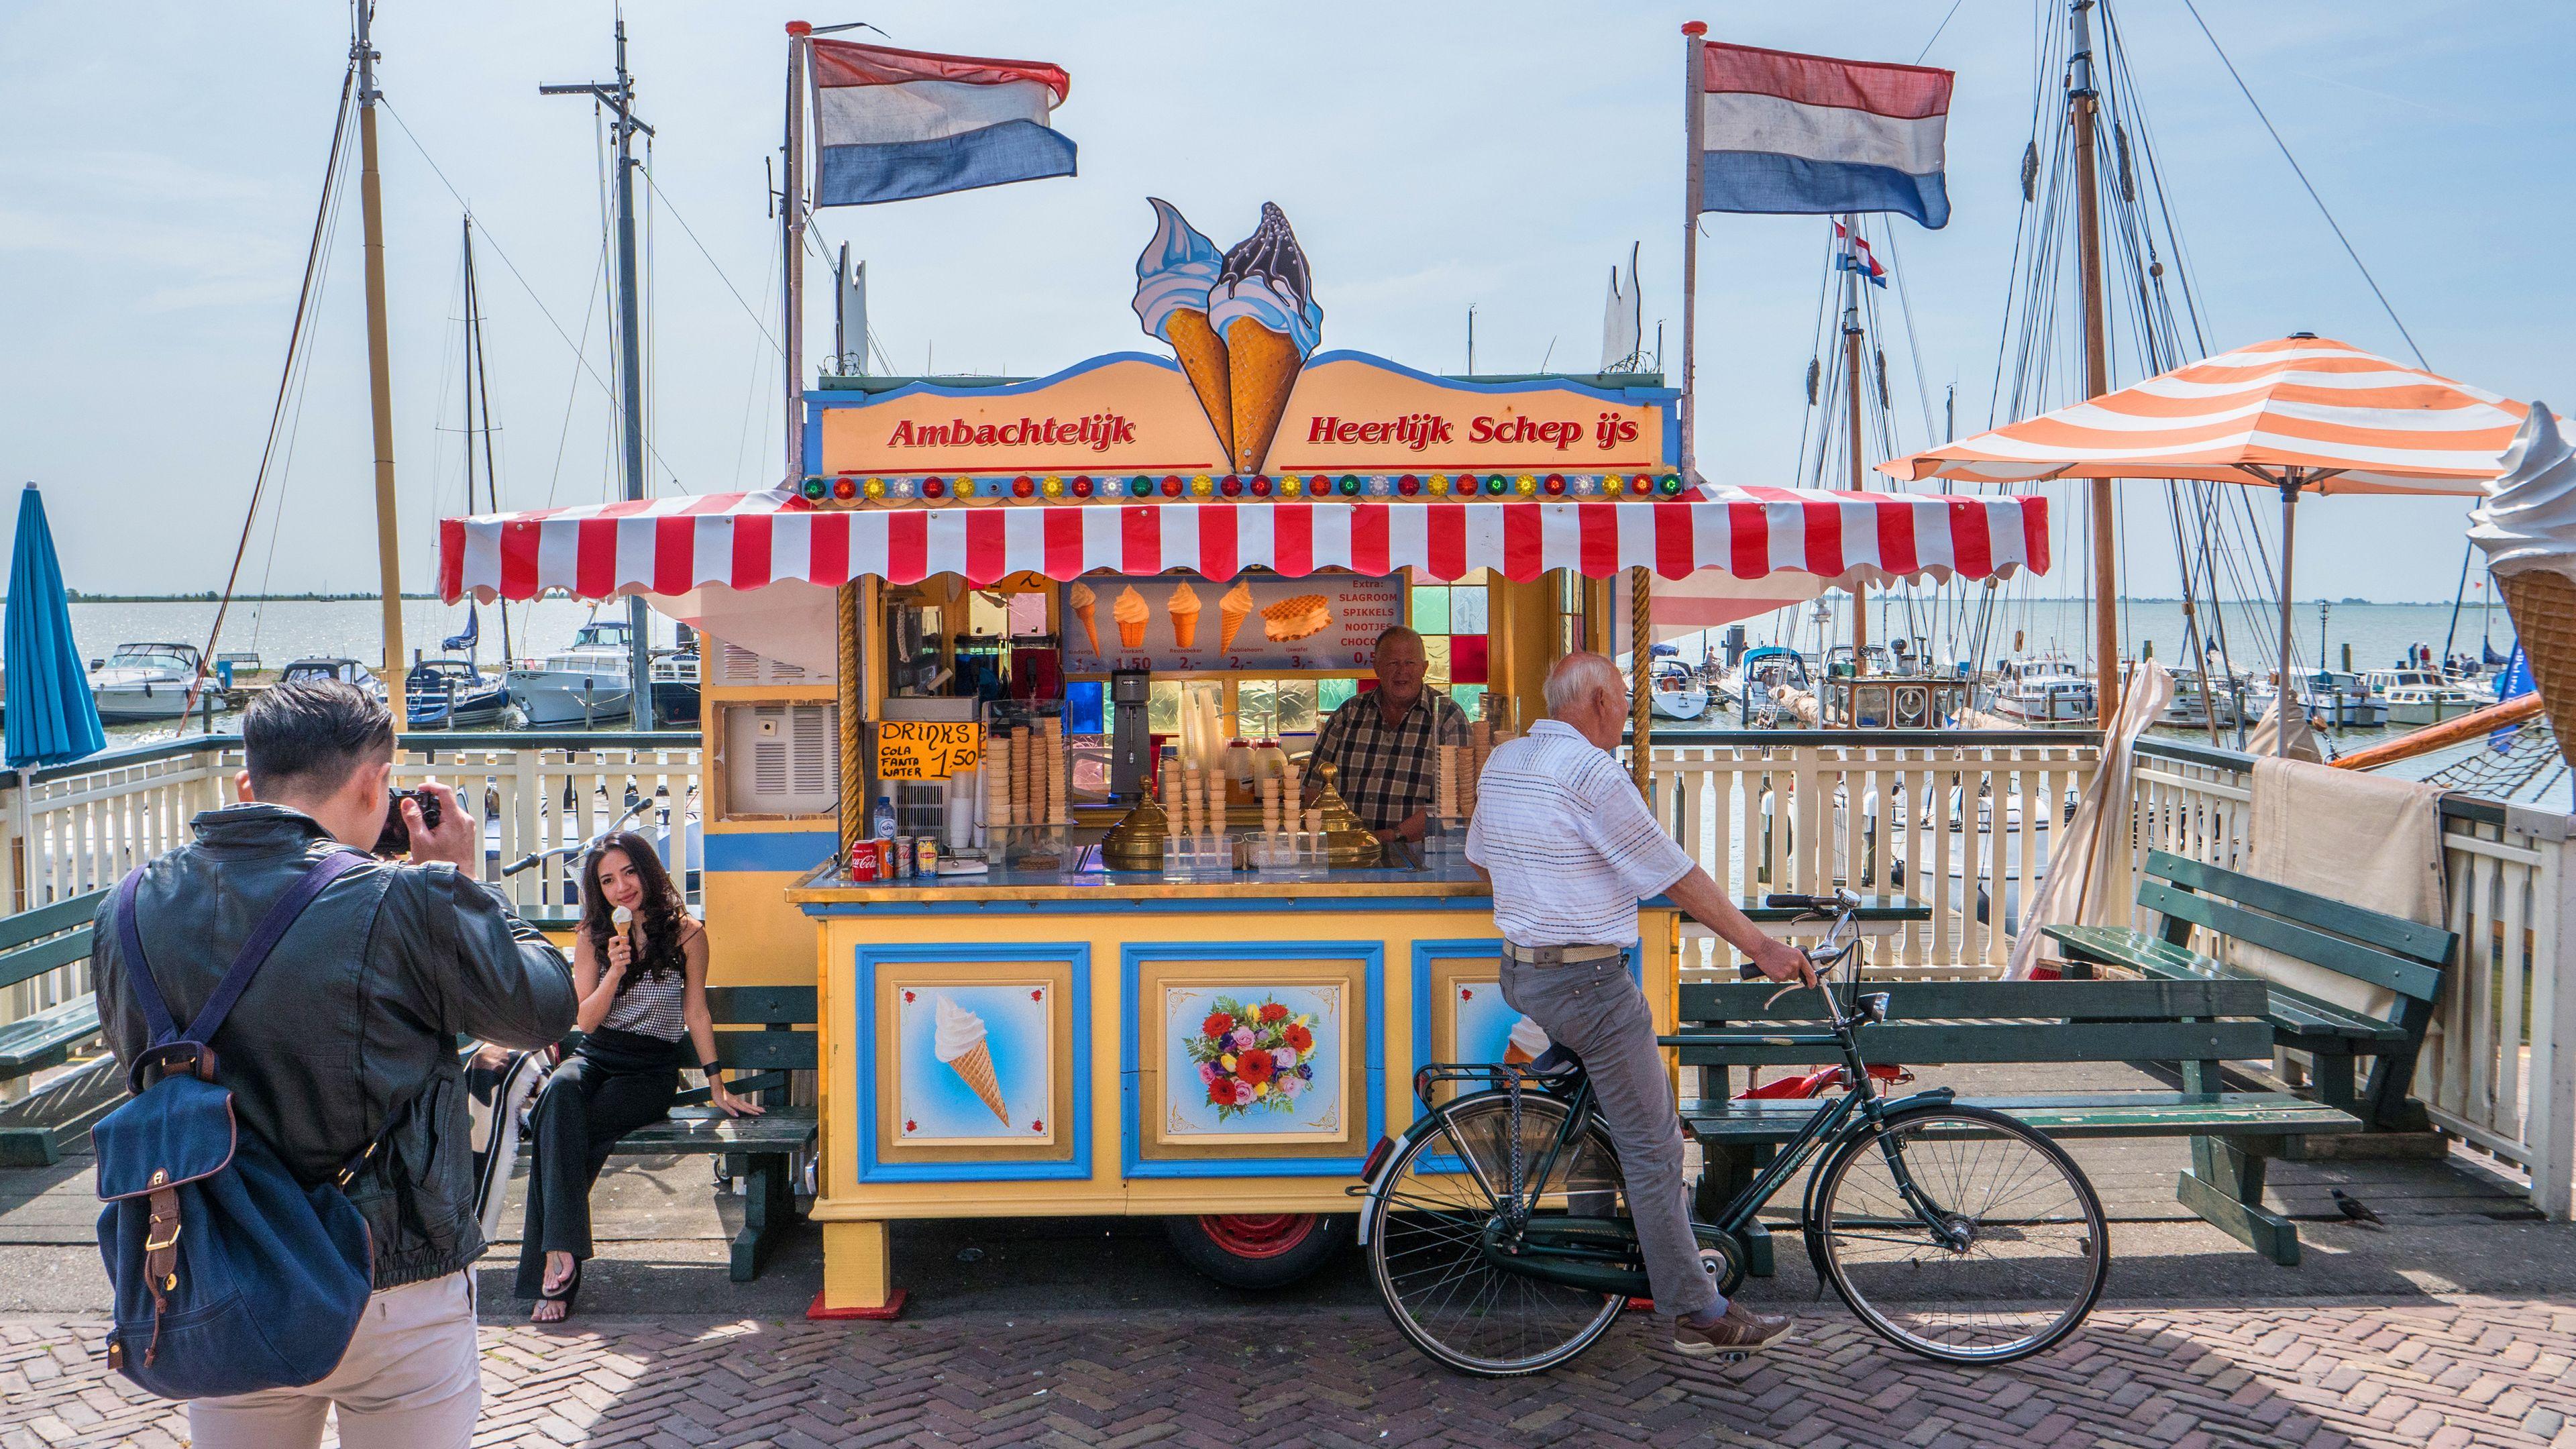 Ice Cream stand in Amsterdam